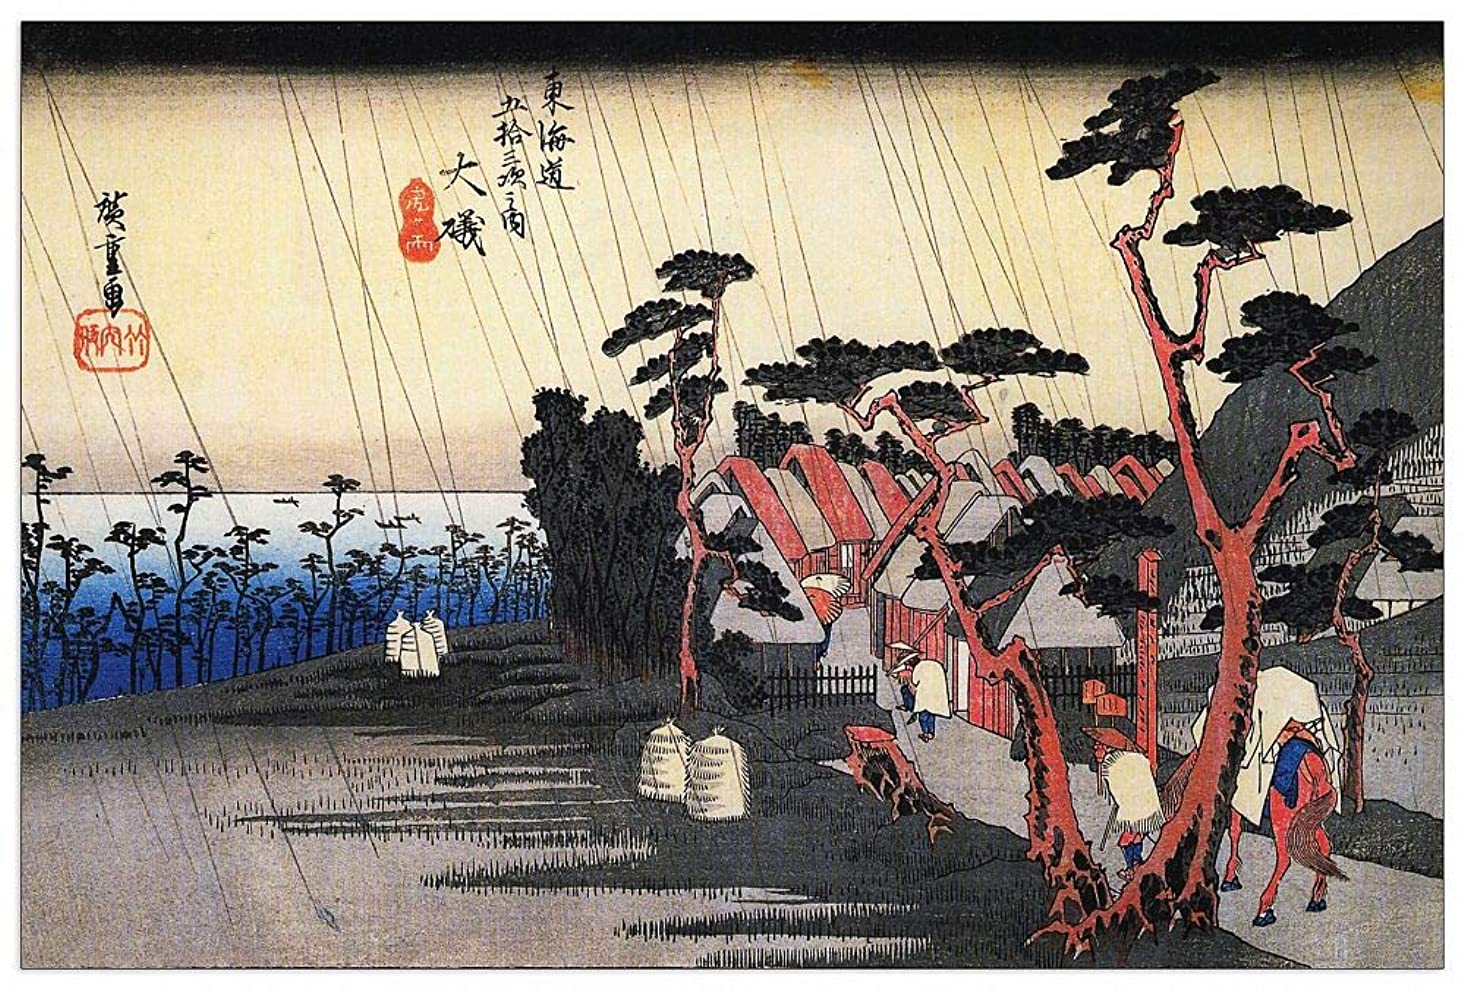 ArtPlaza TW93006 Hiroshige Utagawa - Rain on a Town by The Coast Decorative Panel 39.5x27.5 Inch Multicolored ageet971100